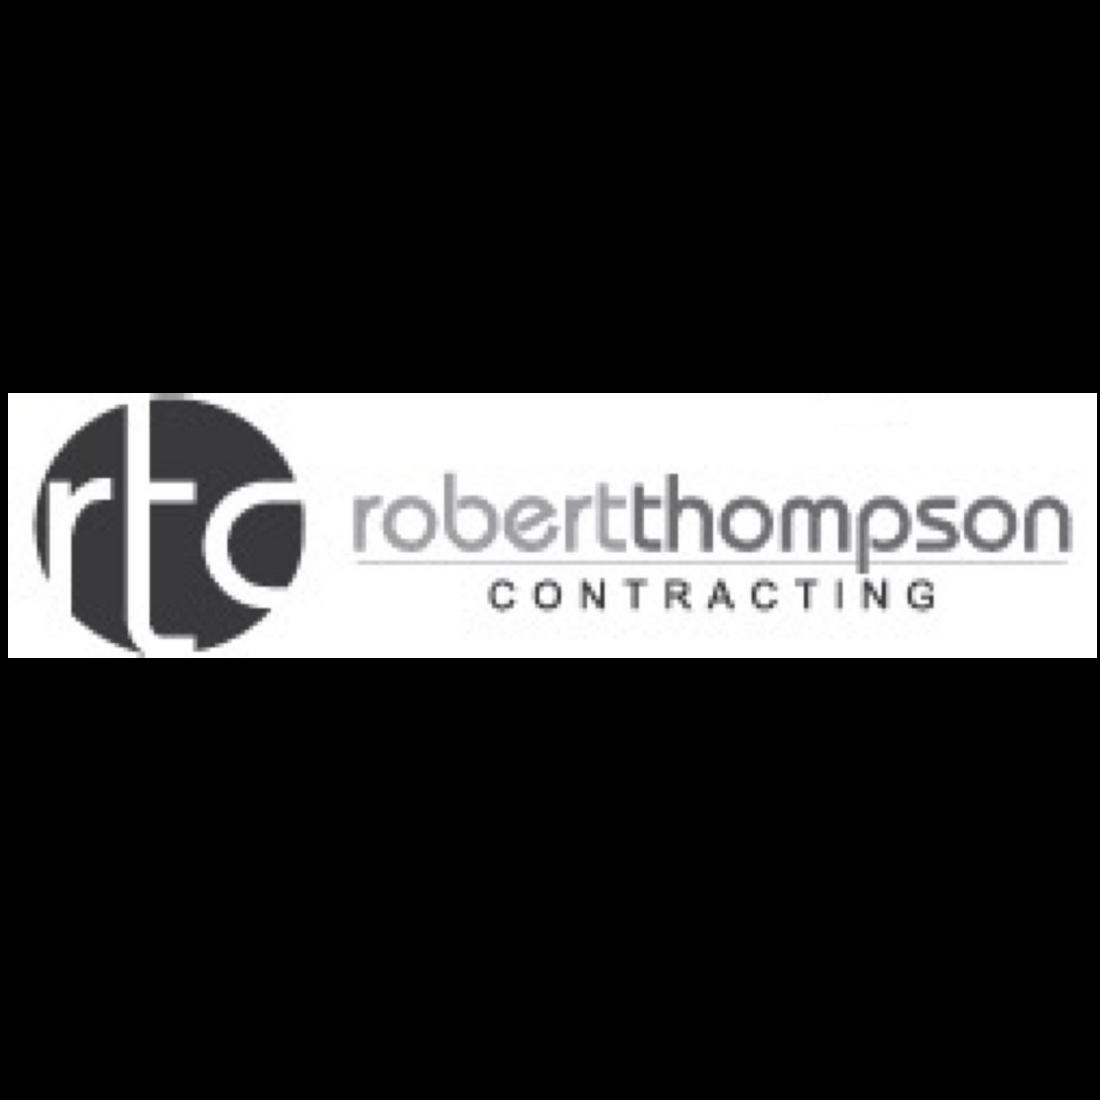 Robert Thompson Contracting